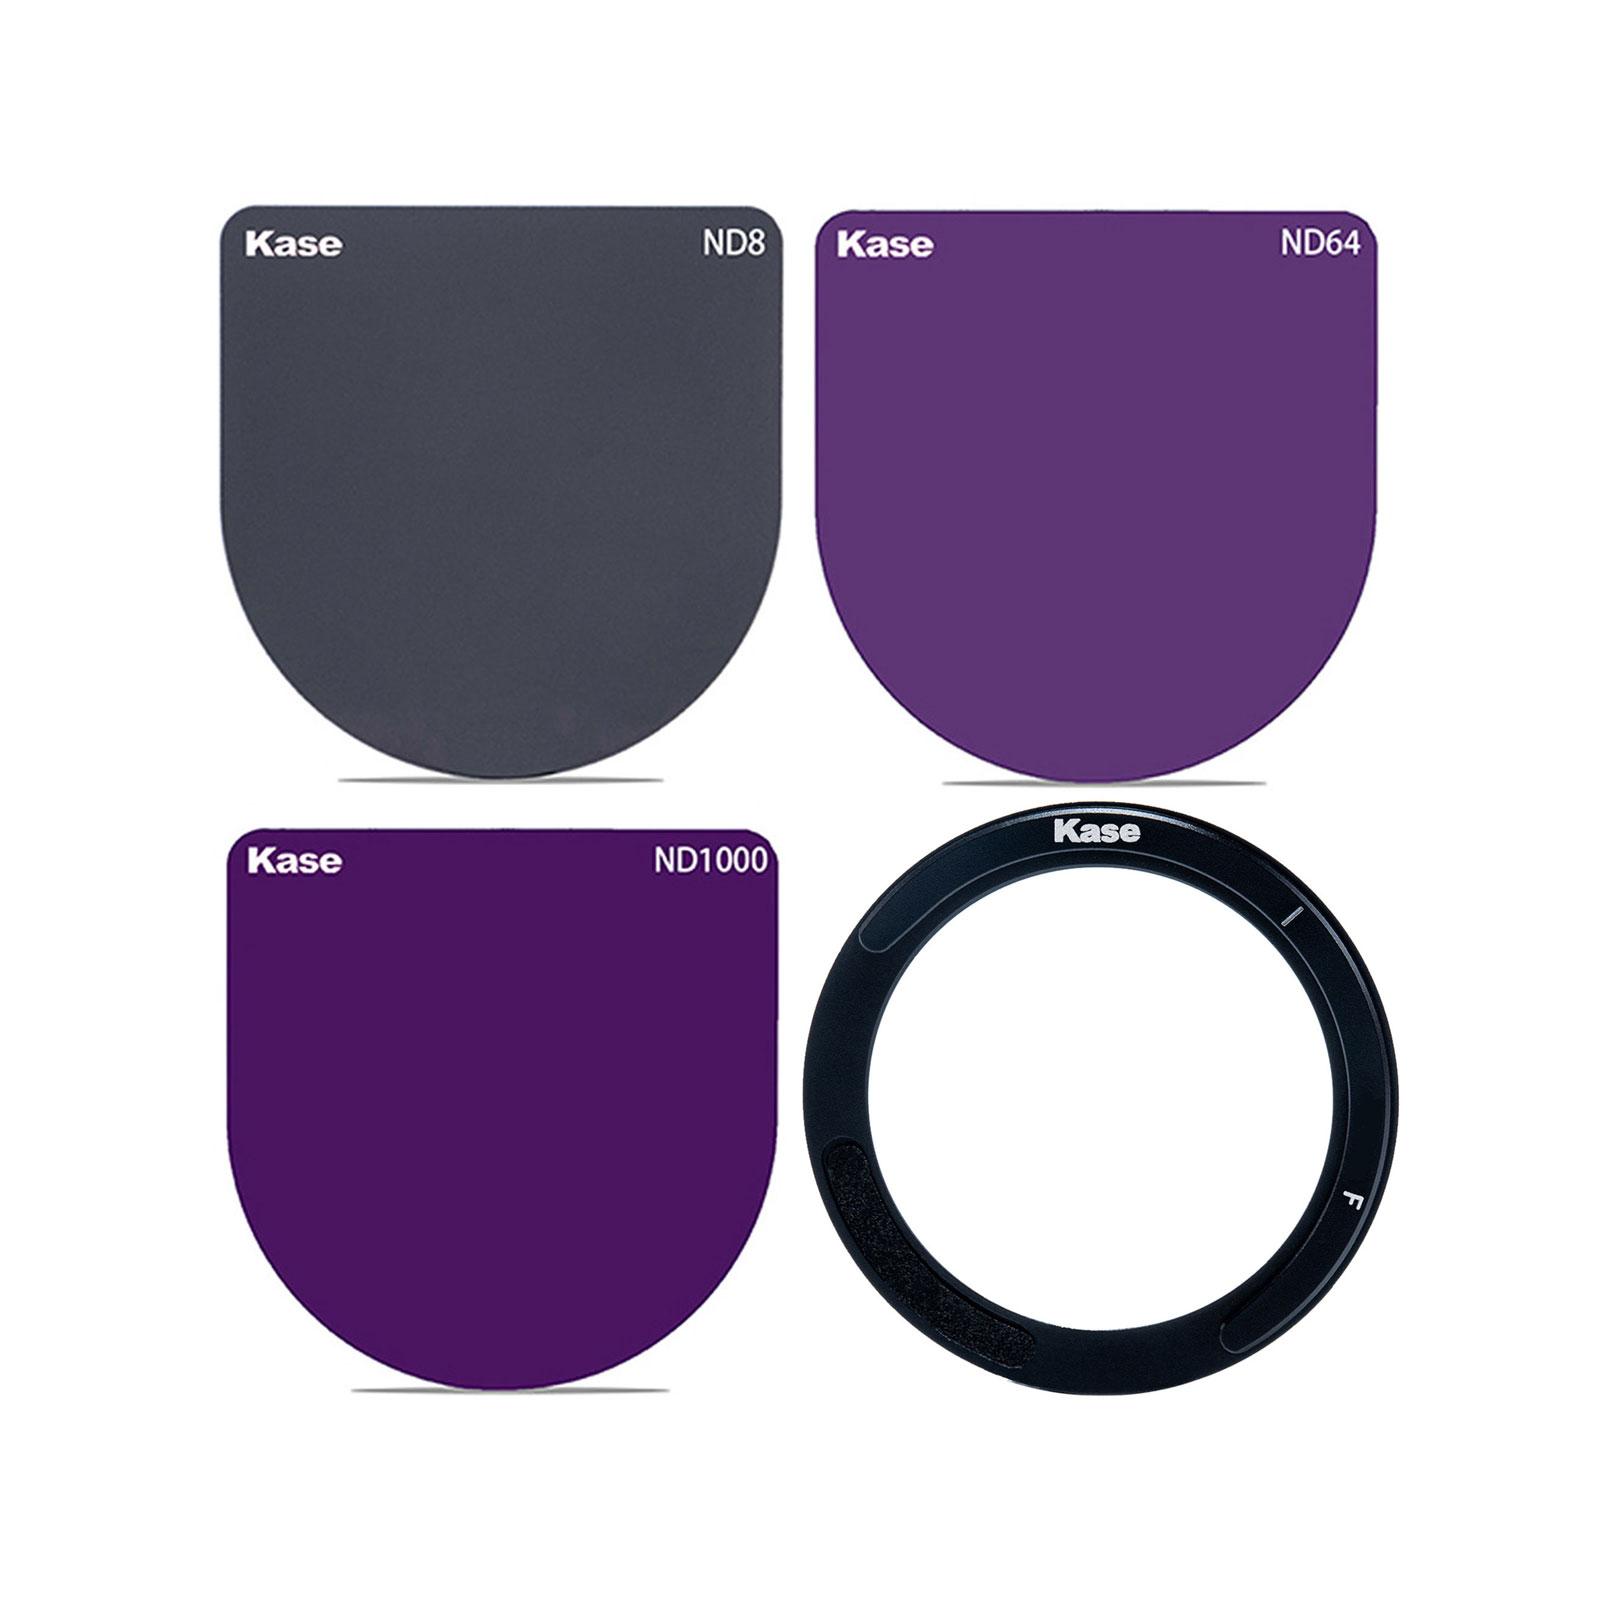 Nikon-14-24mm-3-Filter-Kit